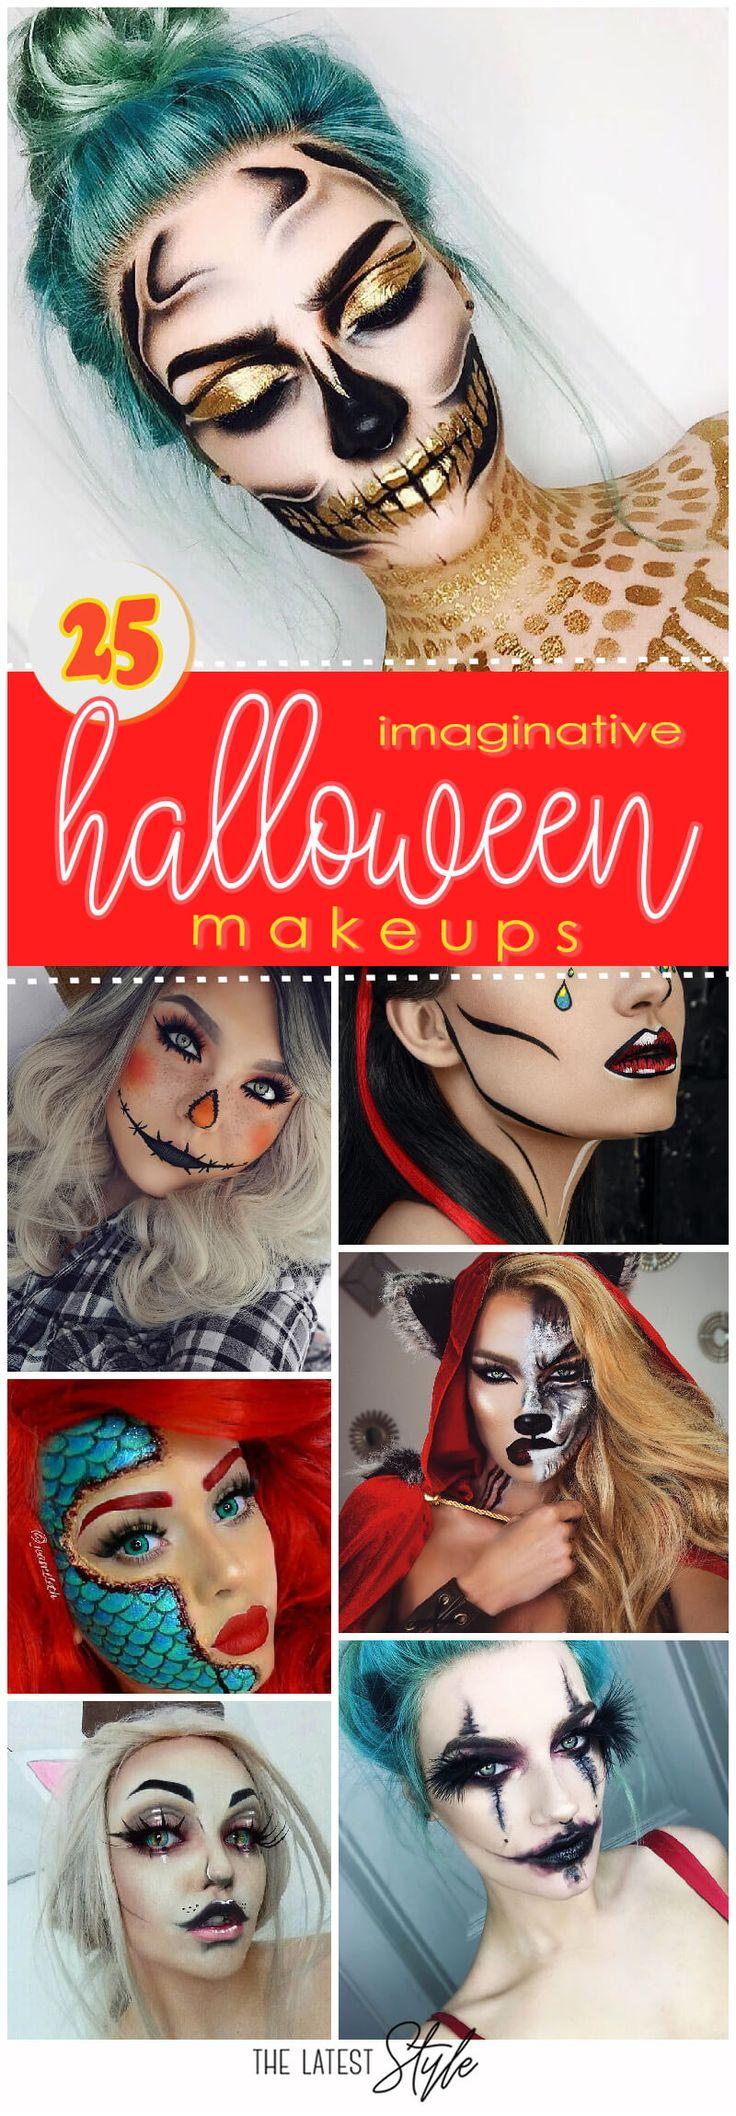 25 Imaginative Halloween Makeup Inspirations From The Instagram